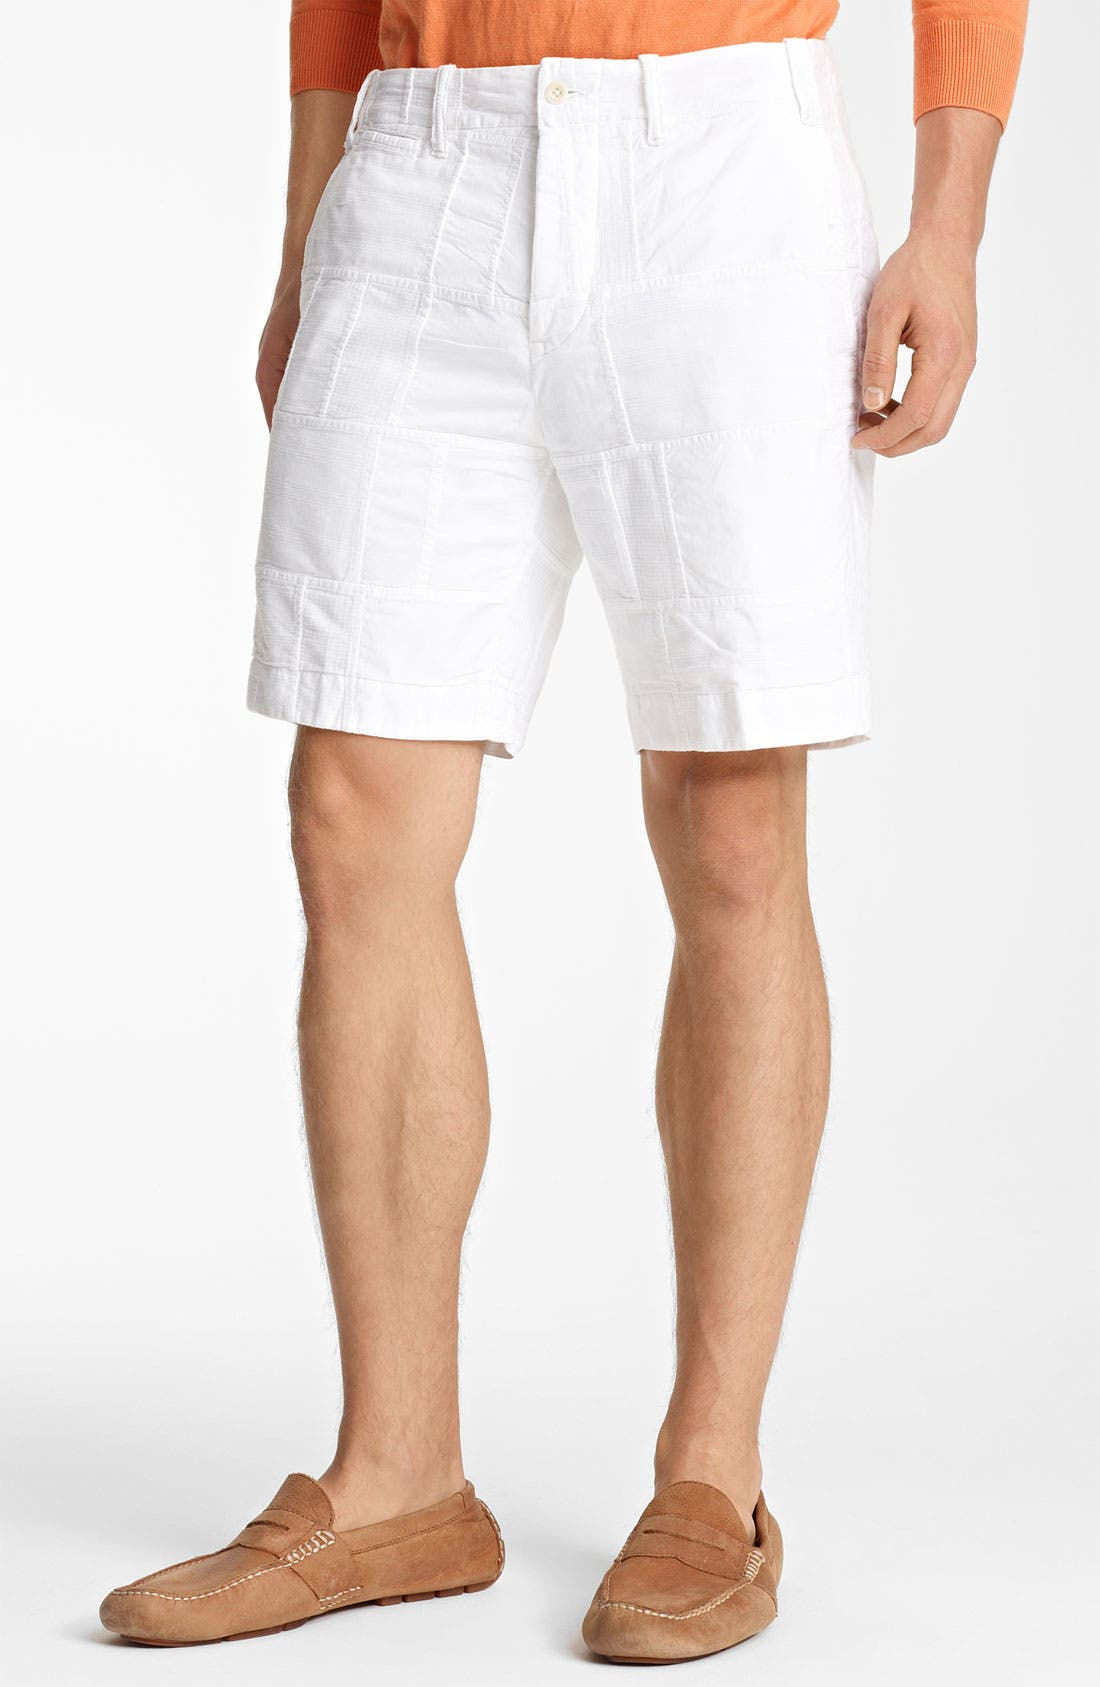 Alternate Image 1 Selected - Polo Ralph Lauren 'Patchwork Modern G.I.' Shorts